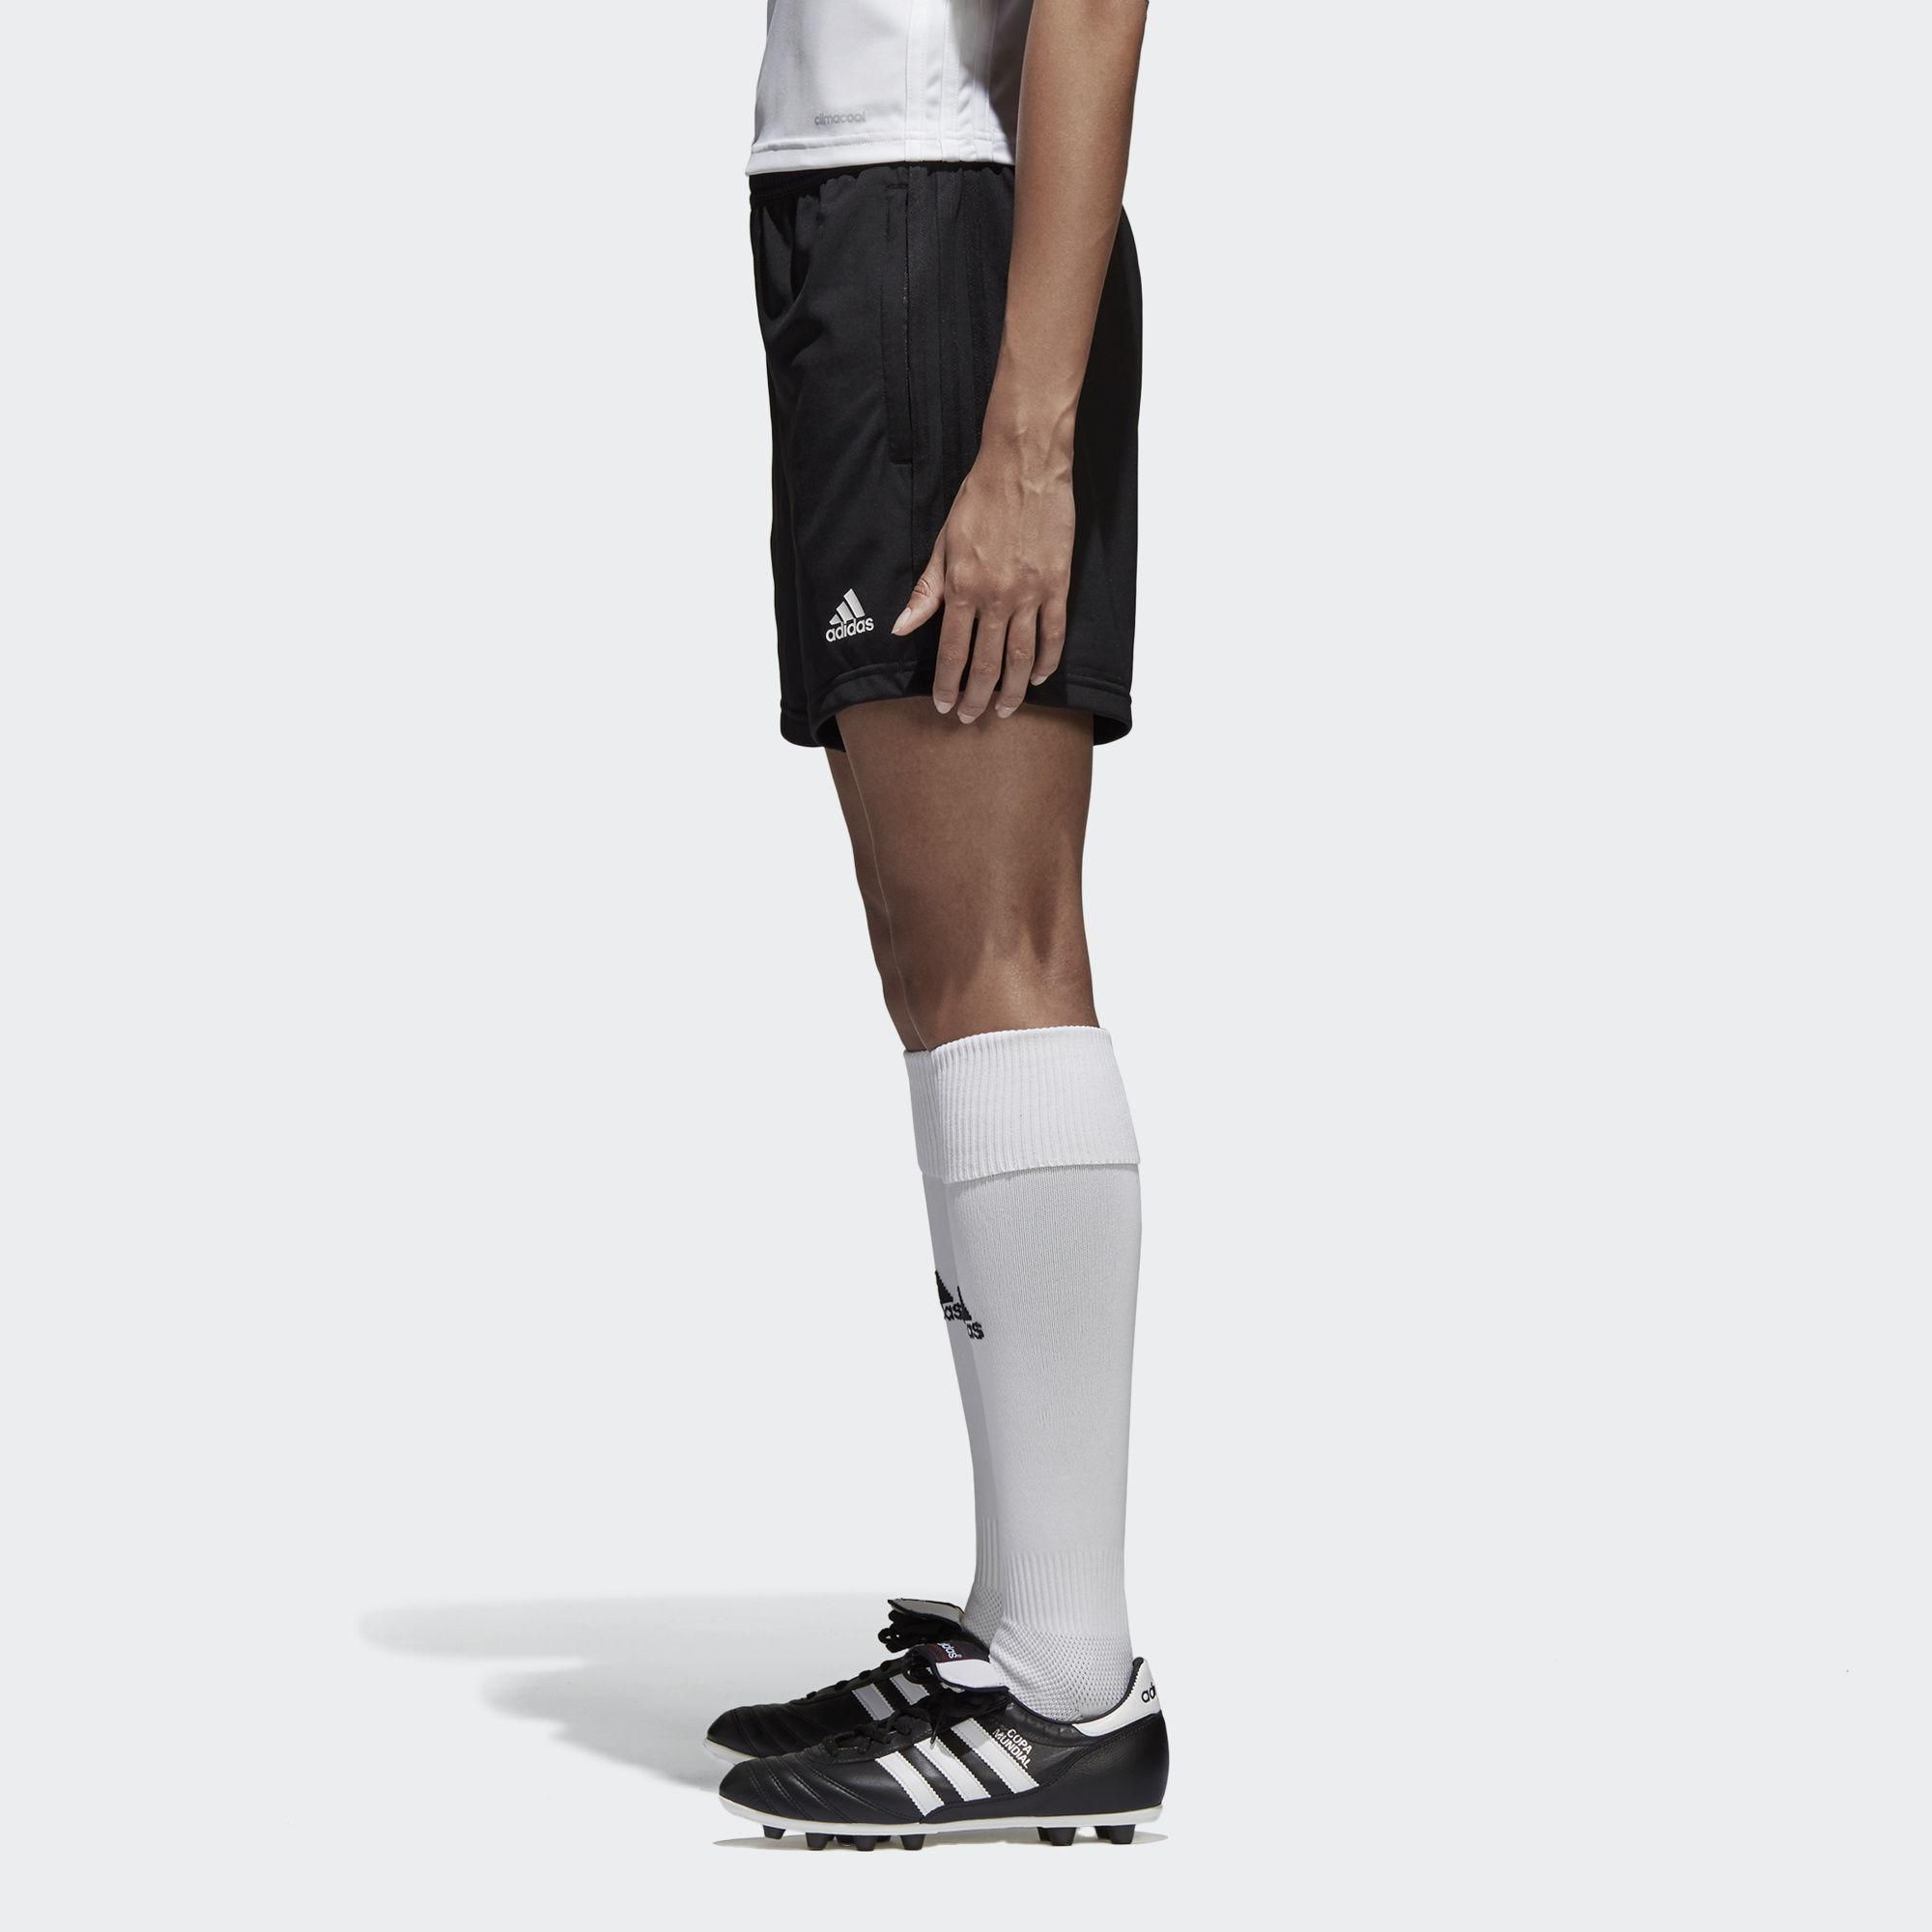 Adidas - Black Condivo 18 Training Shorts for Men - Lyst. View fullscreen f14f5881cd